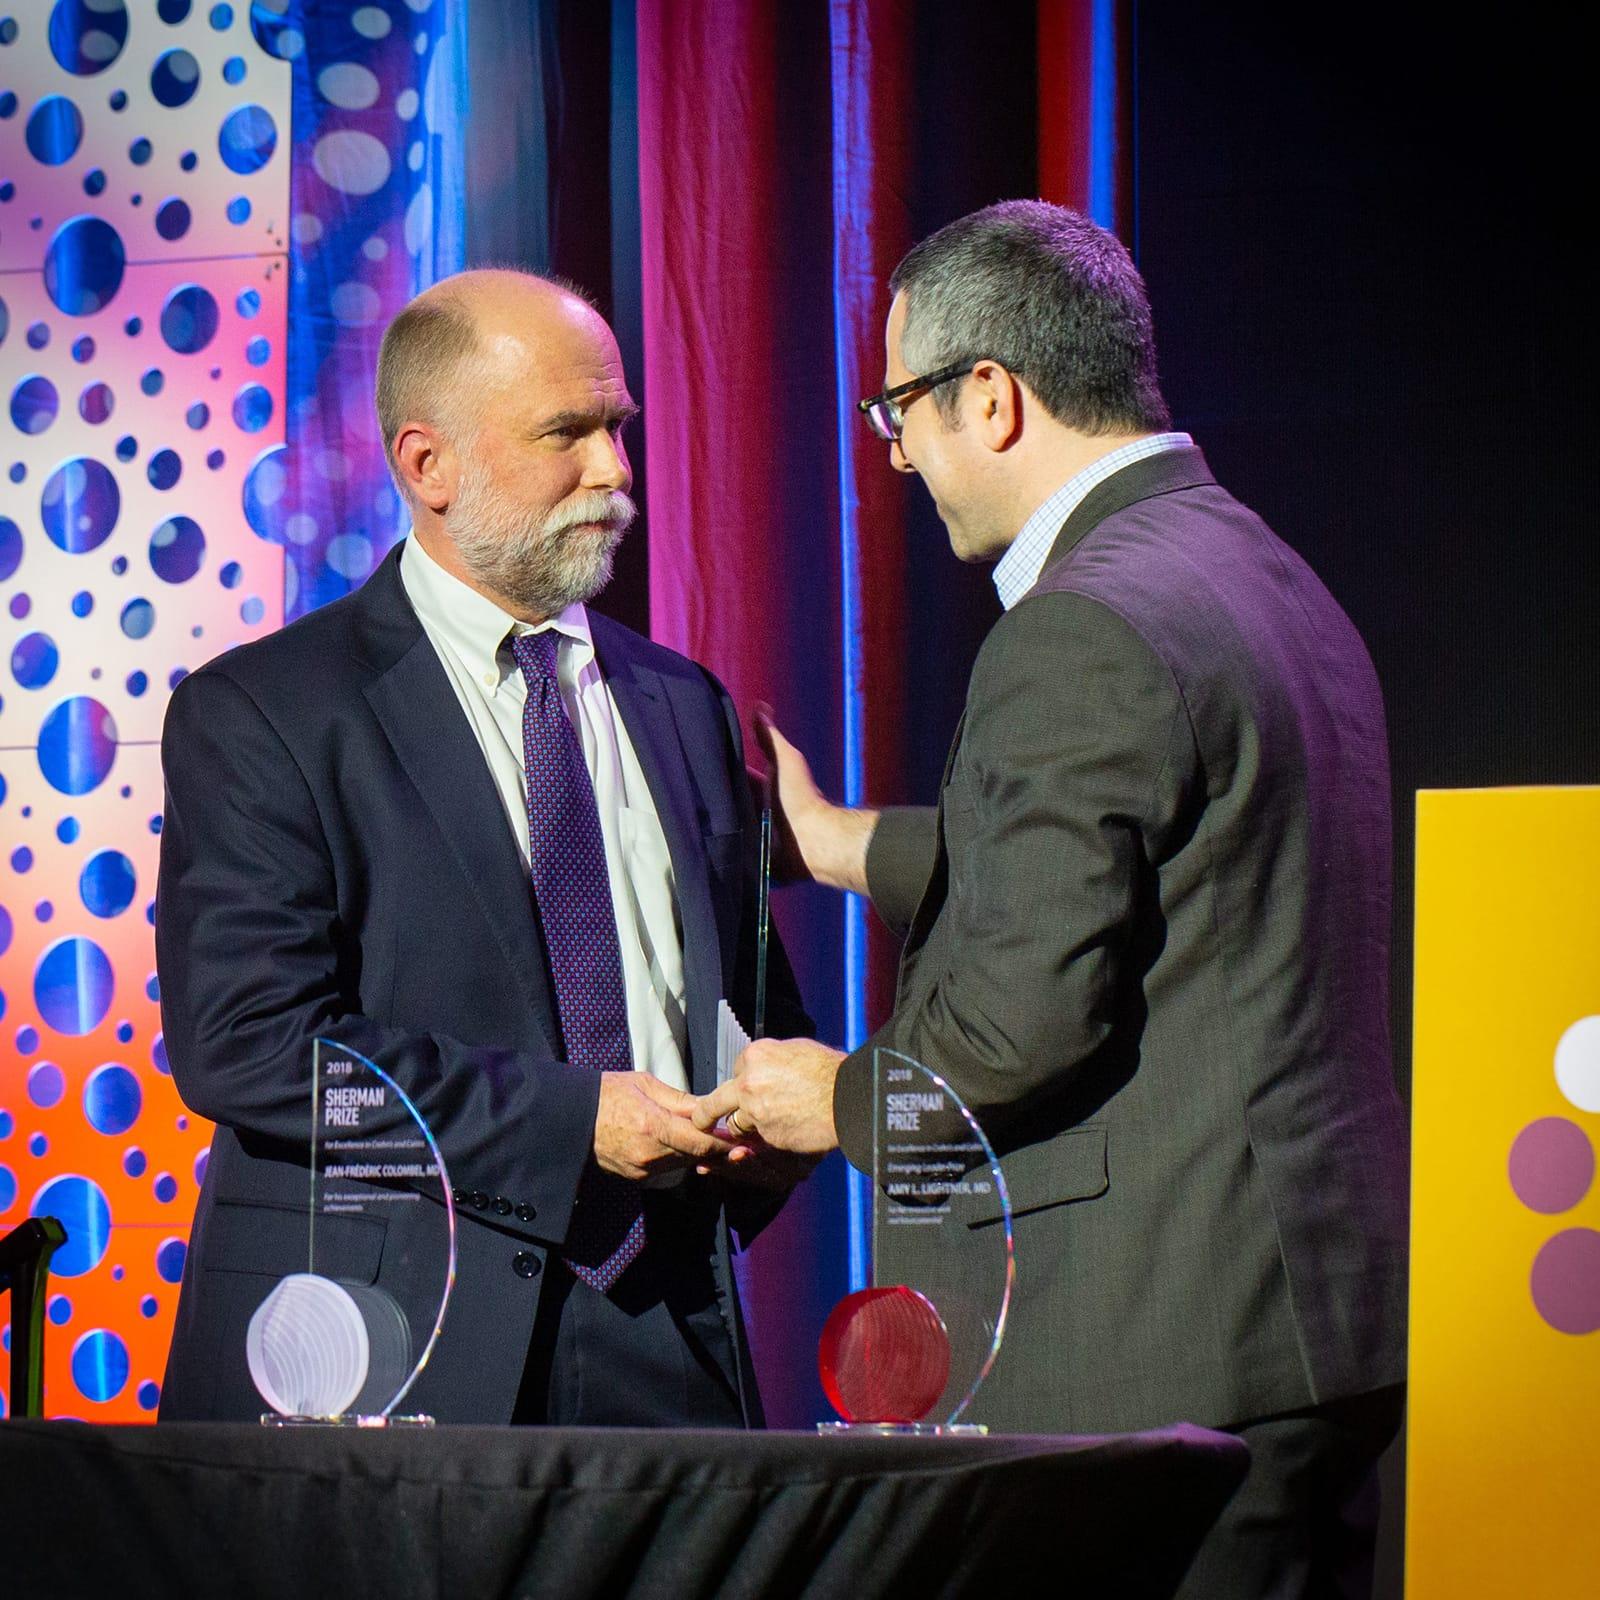 <p>Dr. David Binion and Dr. Corey Siegel</p>